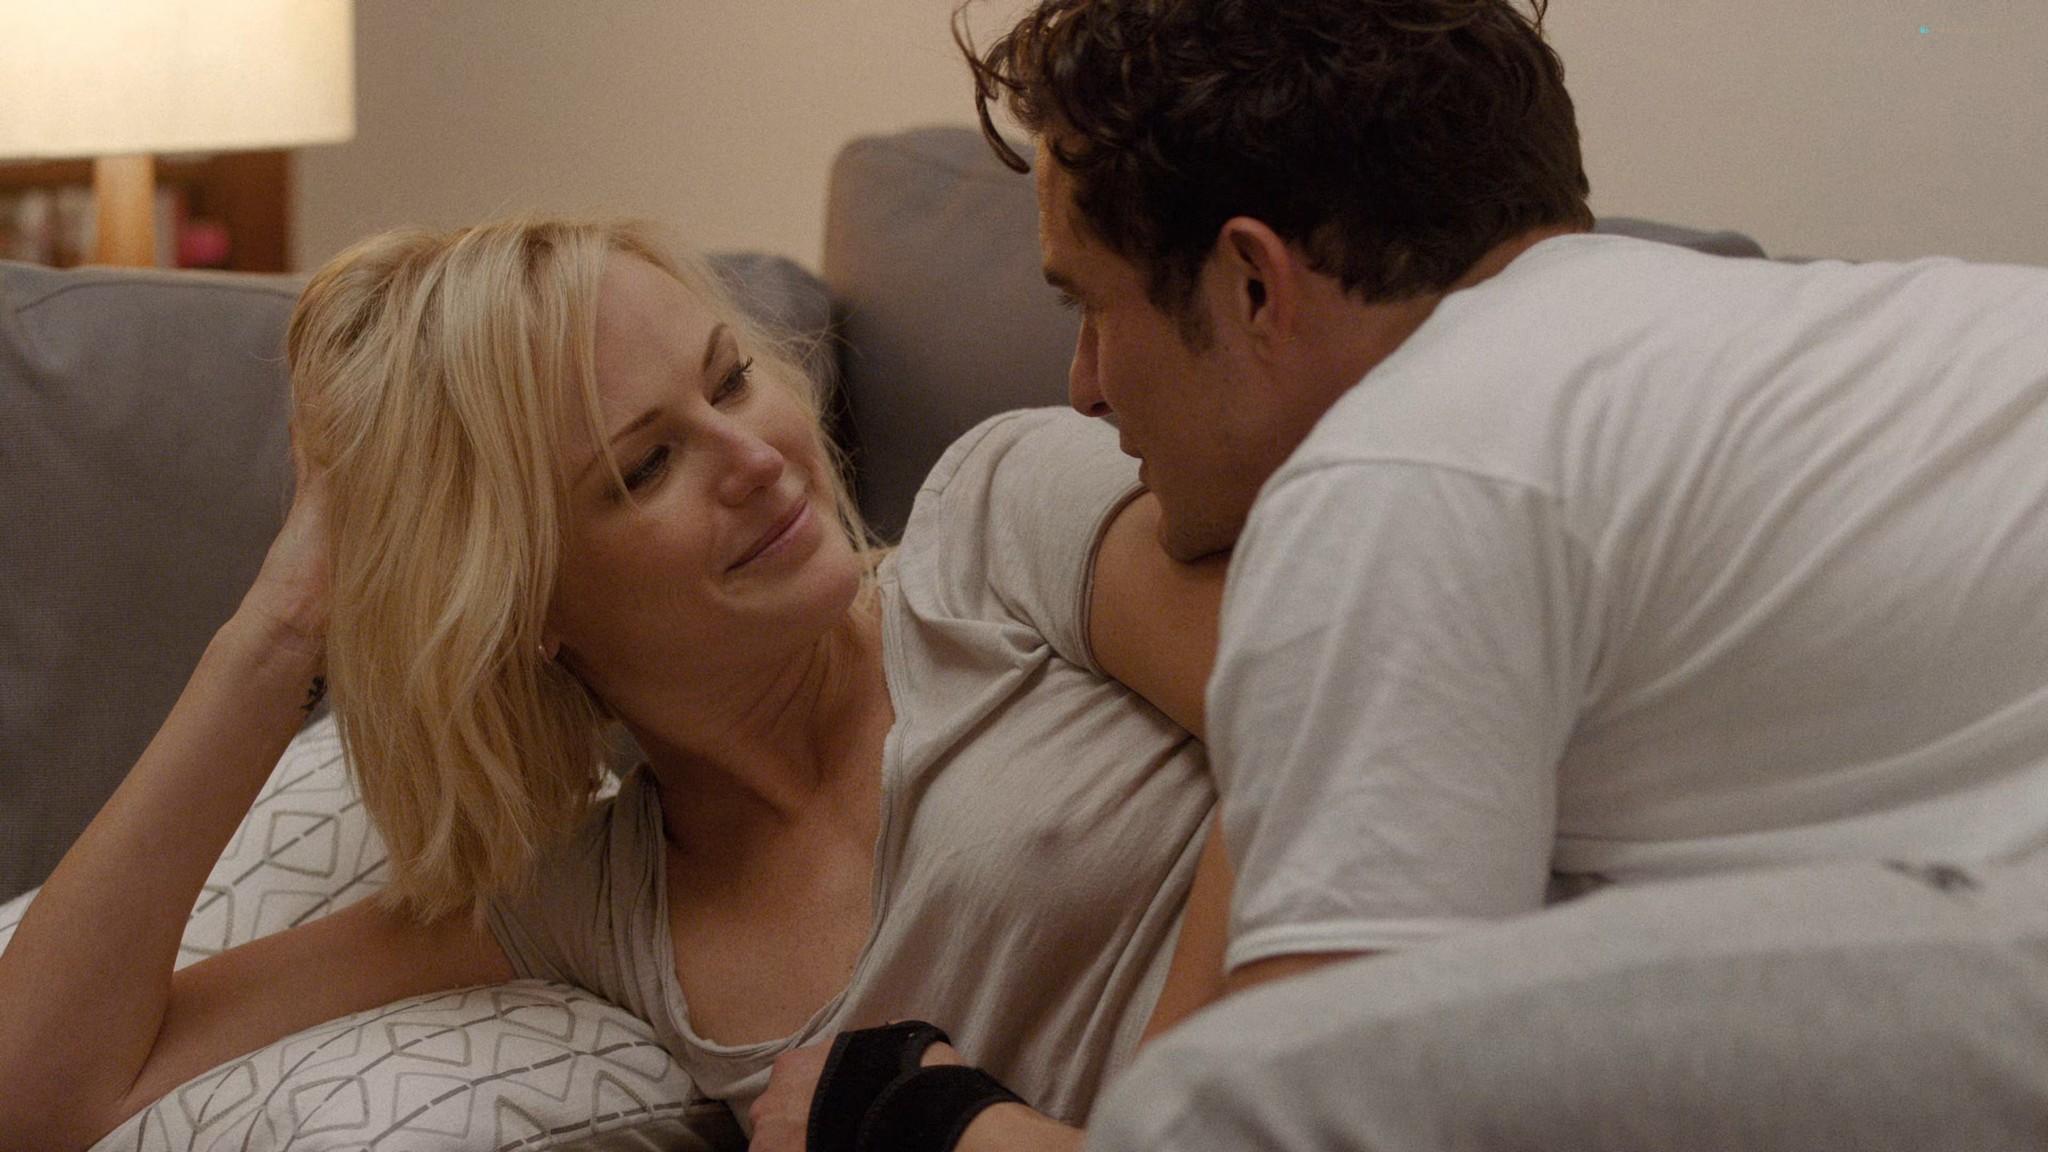 Malin Akerman nude sex threesome with Kate Micucci Easy 2016 s1e6 UHD 2160 1080p 001